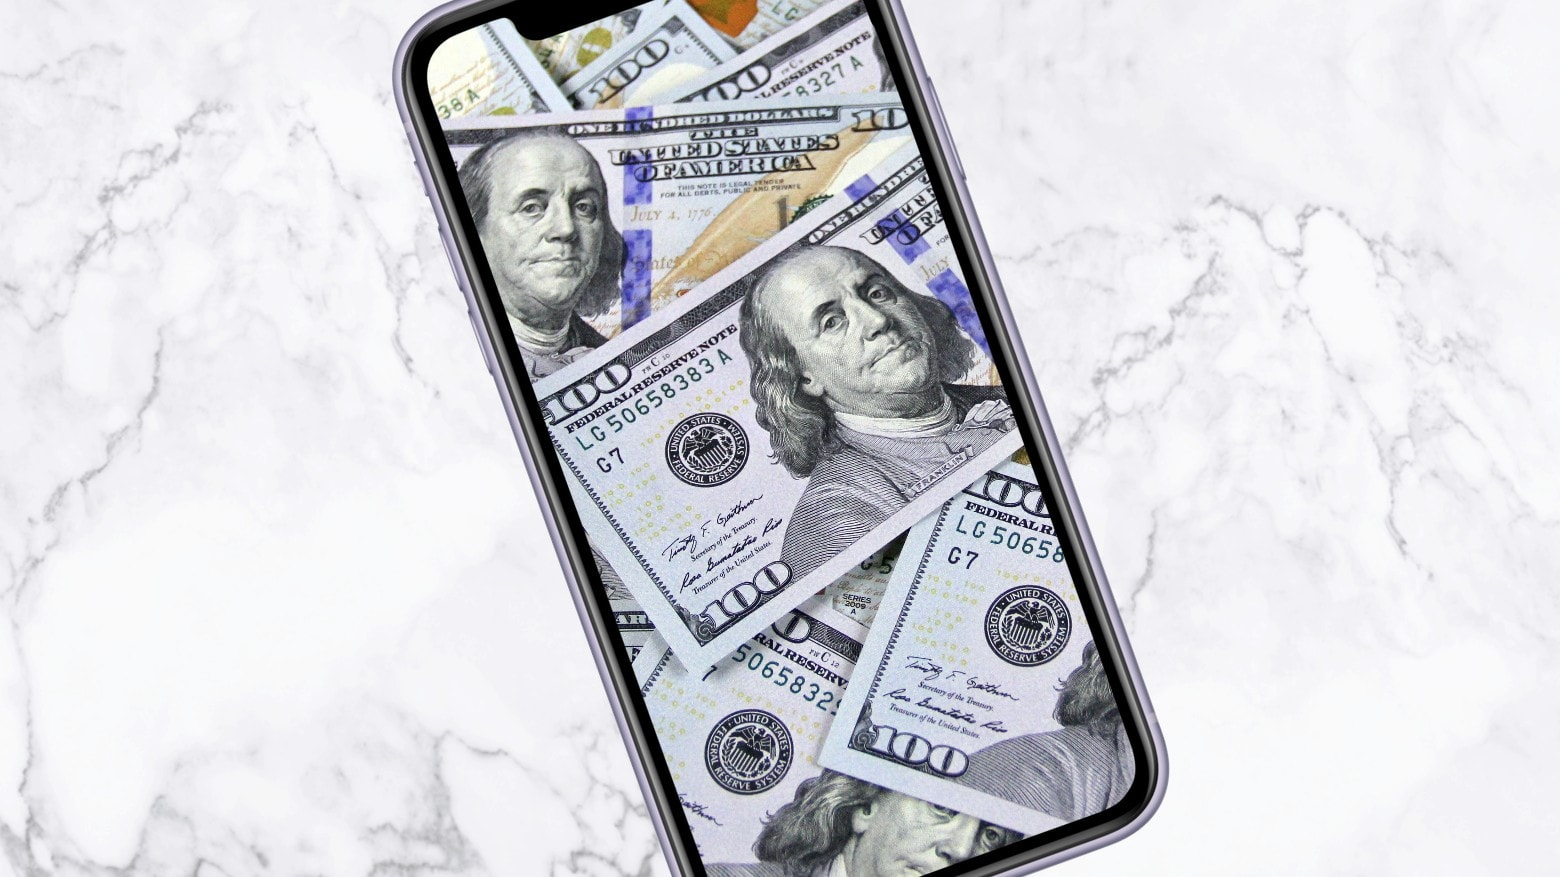 Users spent massive .4 billion in the App Store last year